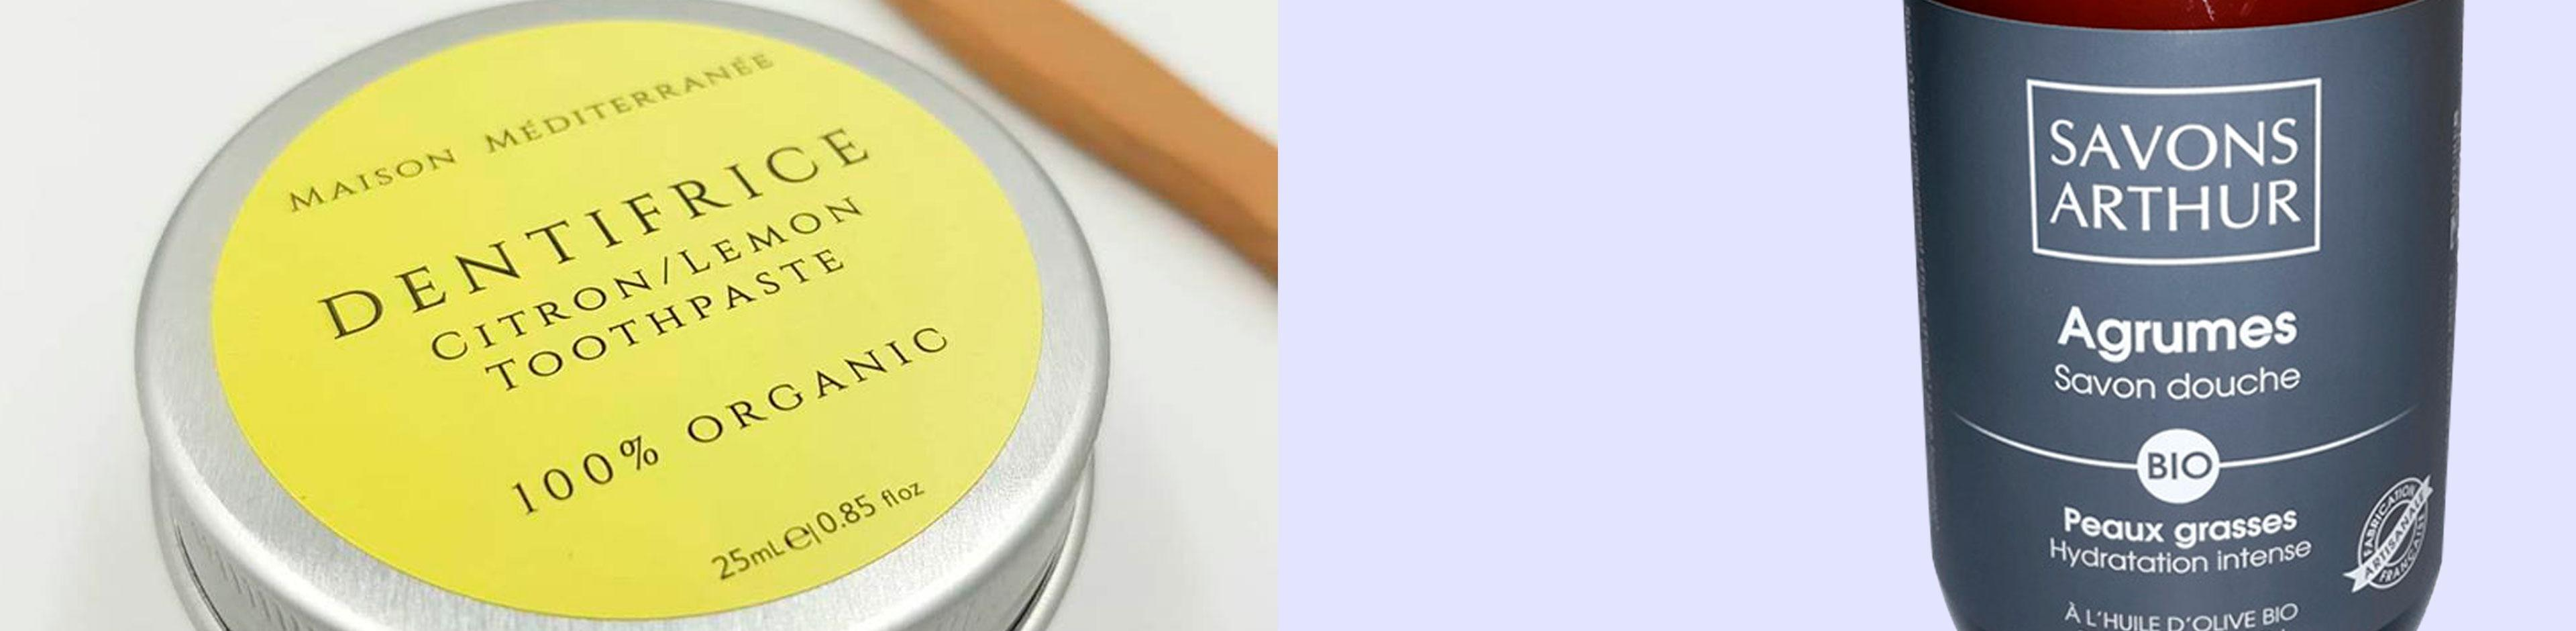 parfumerie et cosmetique